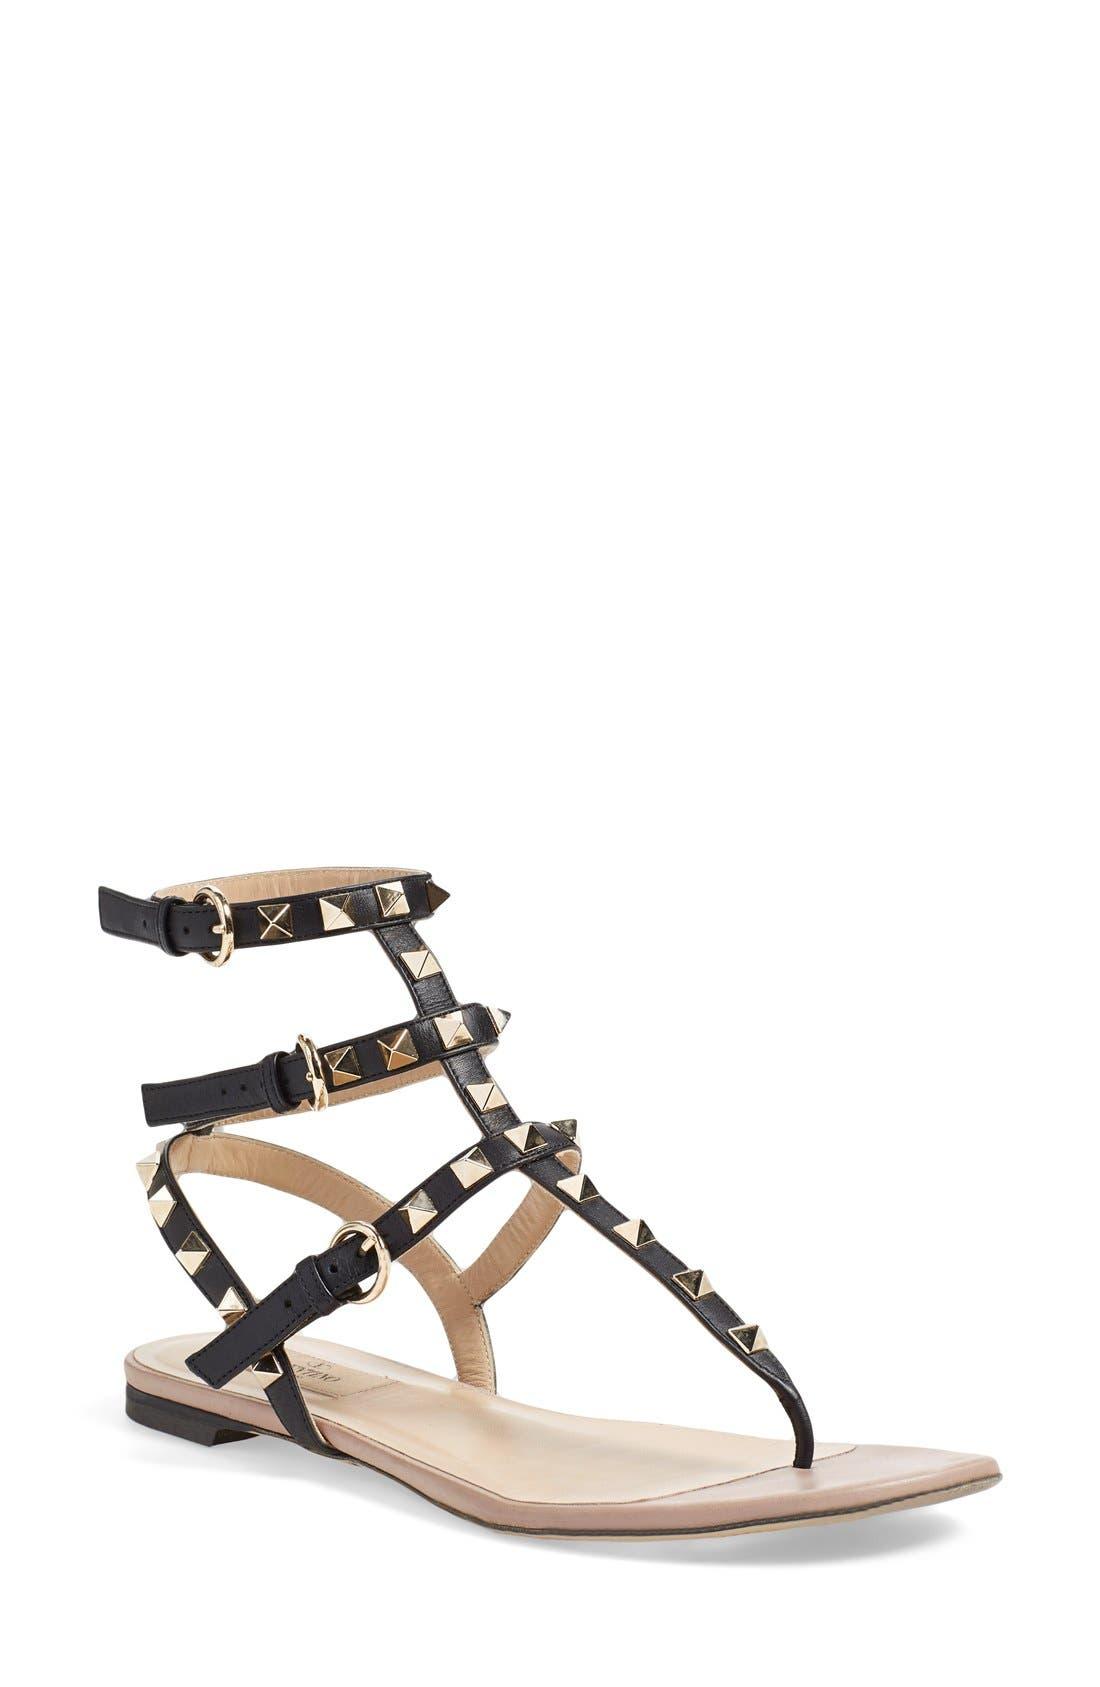 'Rockstud' Sandal,                         Main,                         color, Black Leather